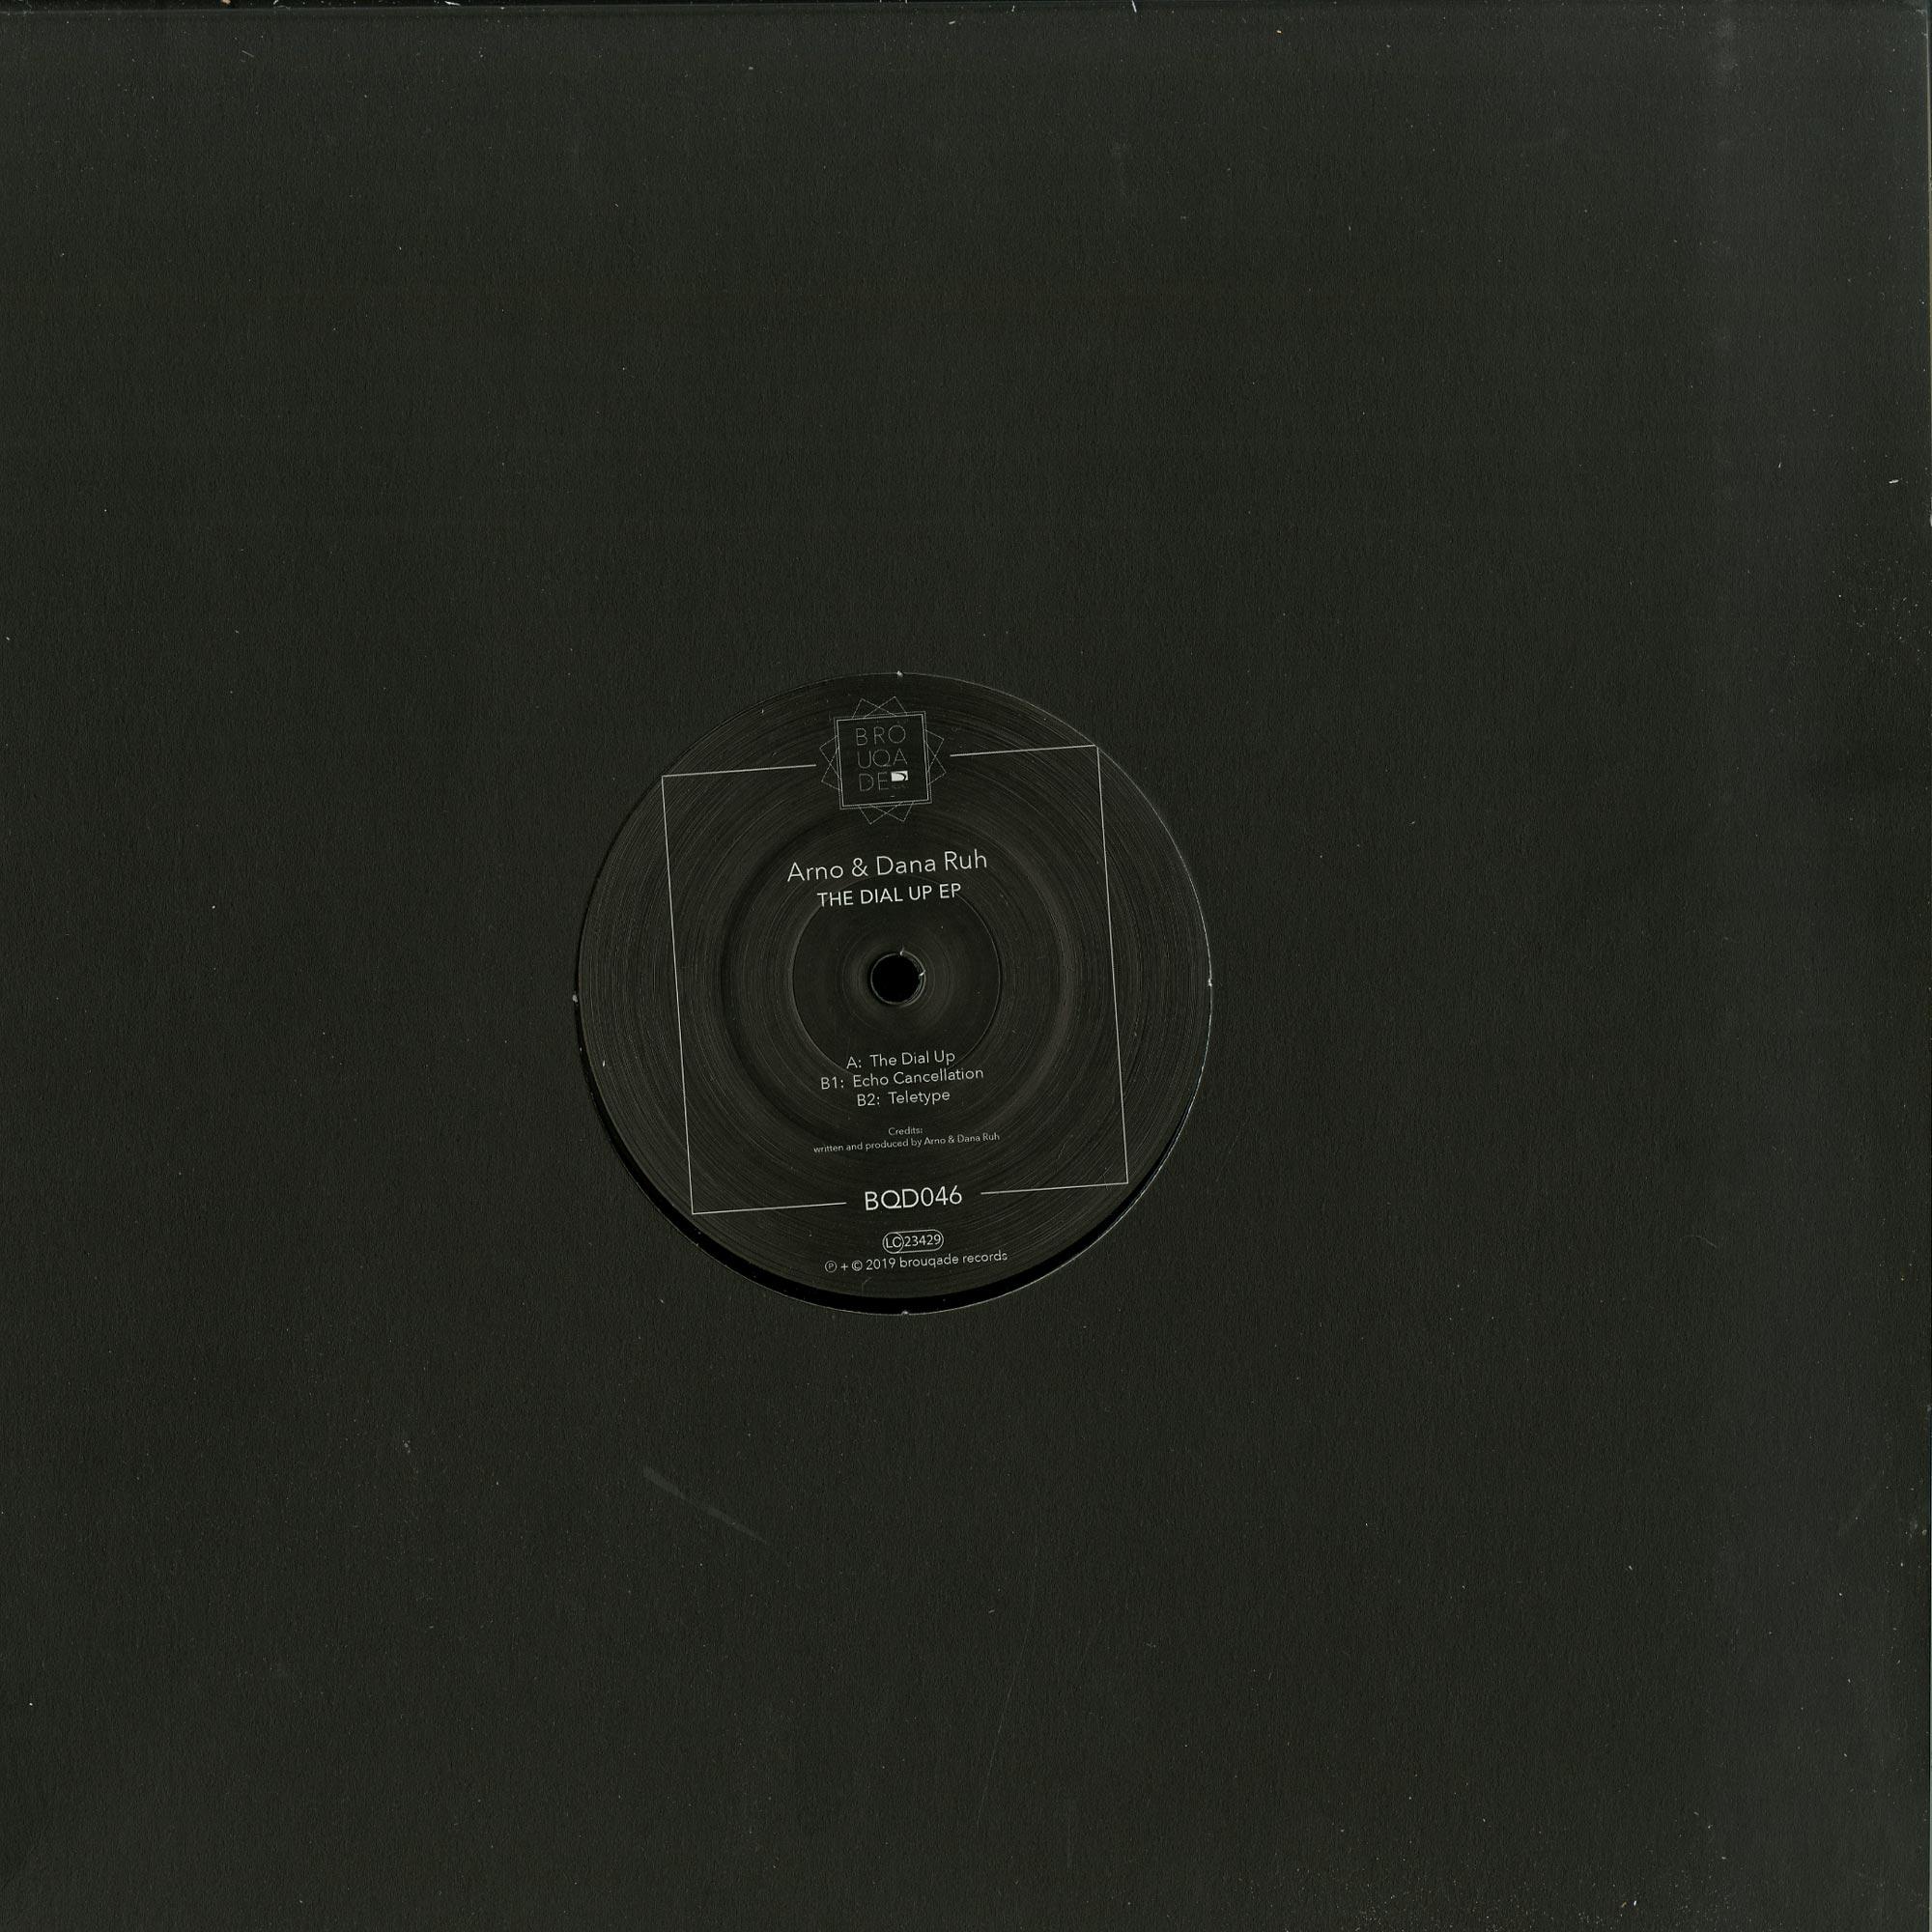 Arno & Dana Ruh - THE DAIL UP EP